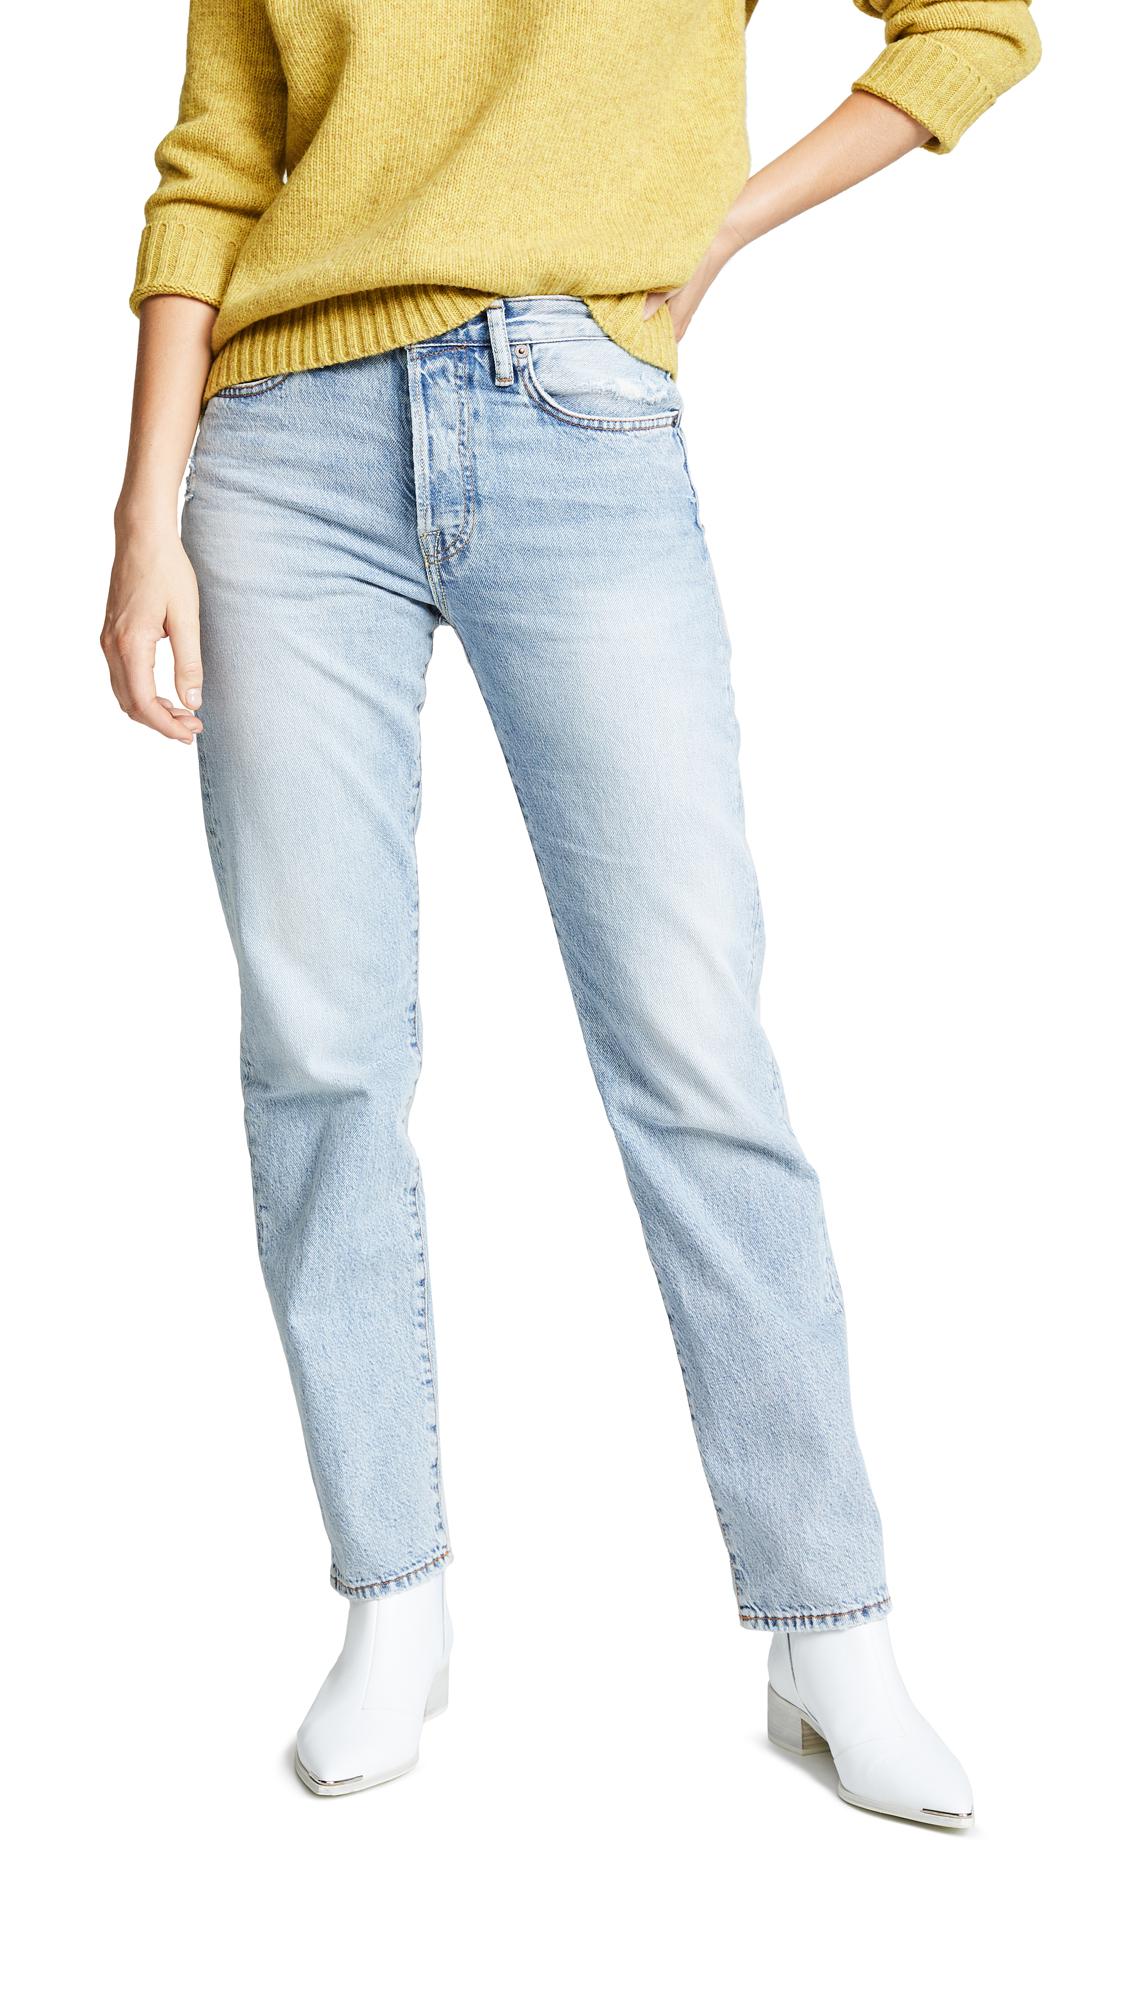 1997 Jeans, Light Blue Trash